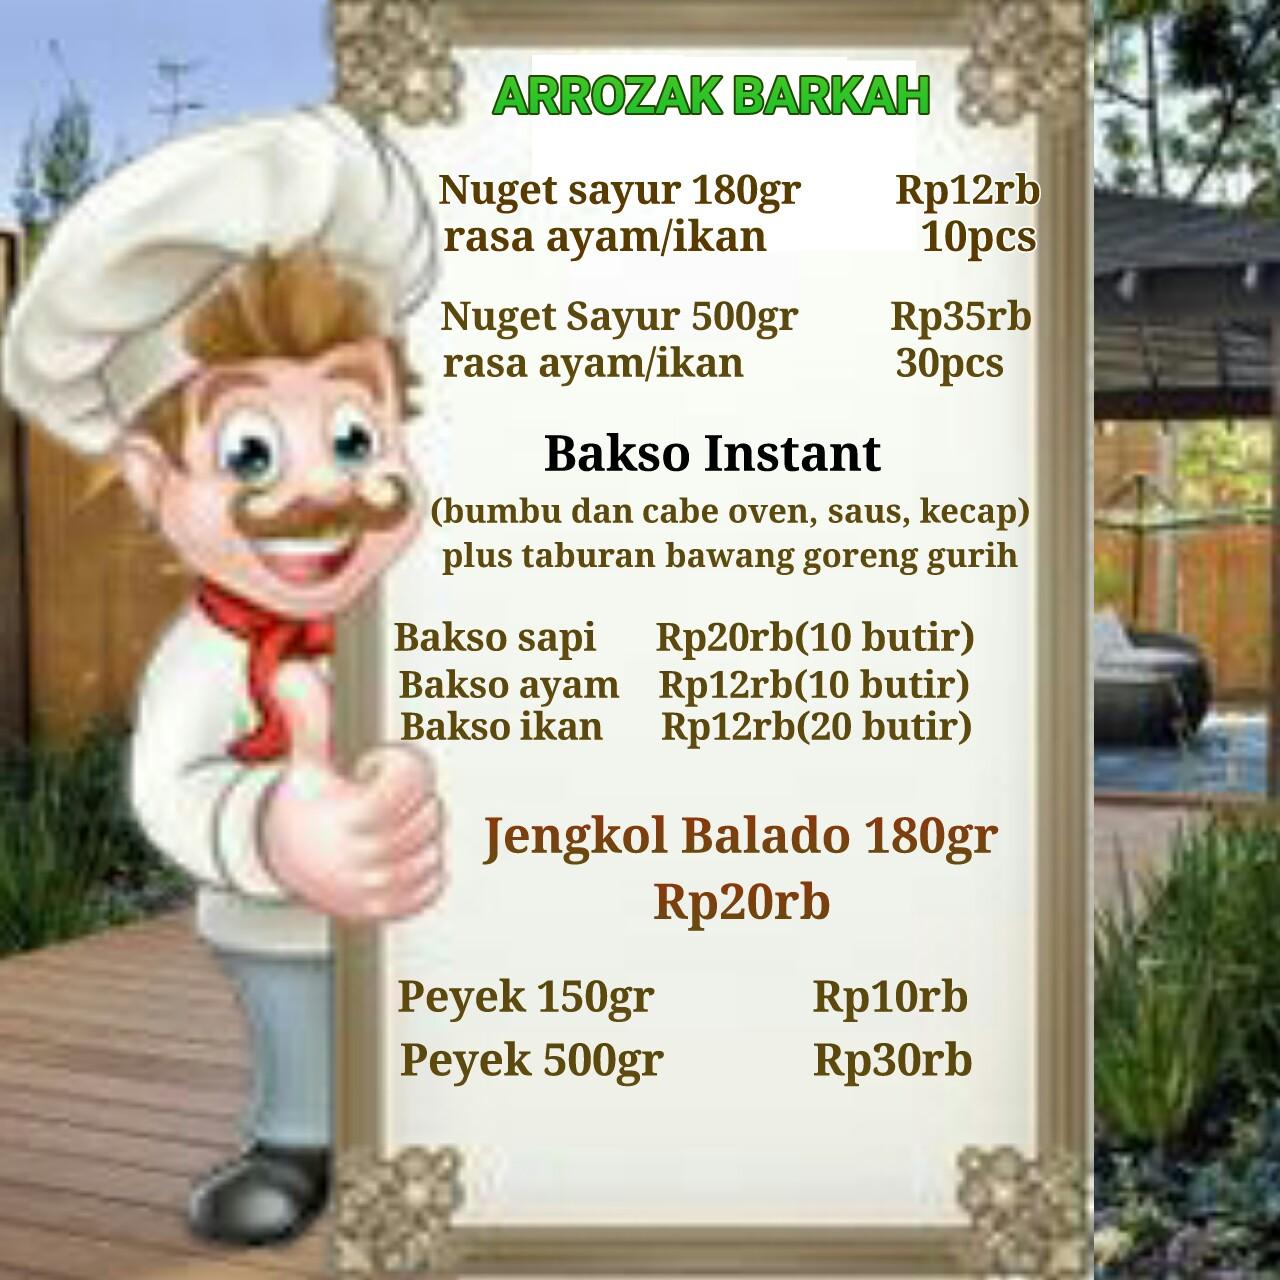 ARROZAK BARKAH PRODUCT